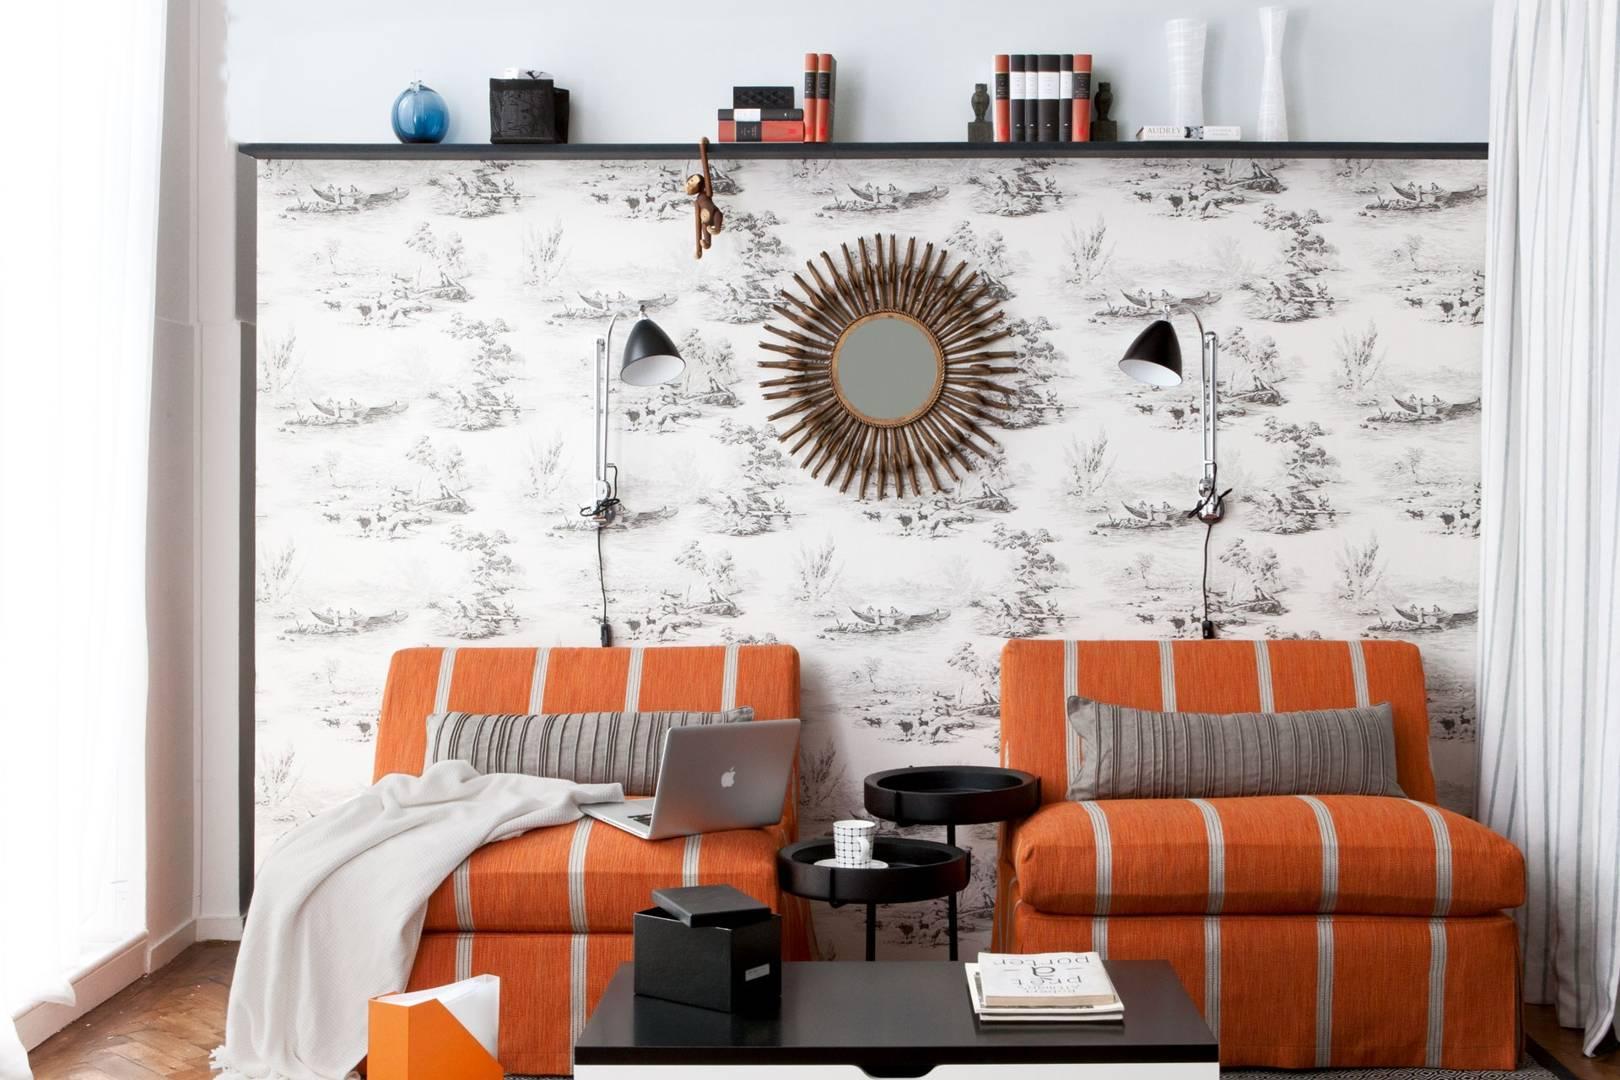 Sofa Bed Small Living Room Ideas House Garden